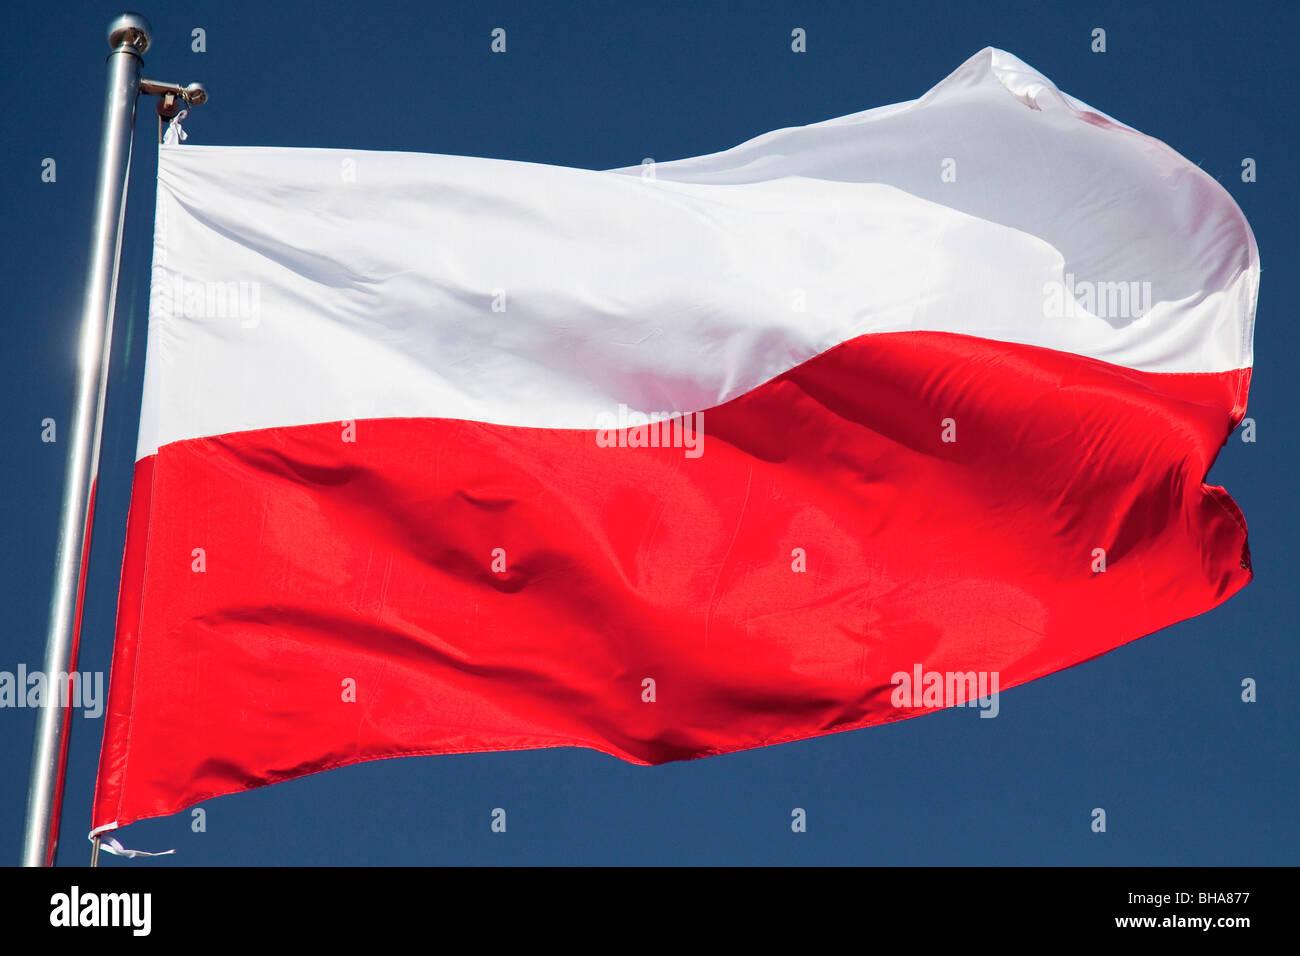 Flag of Poland - Stock Image